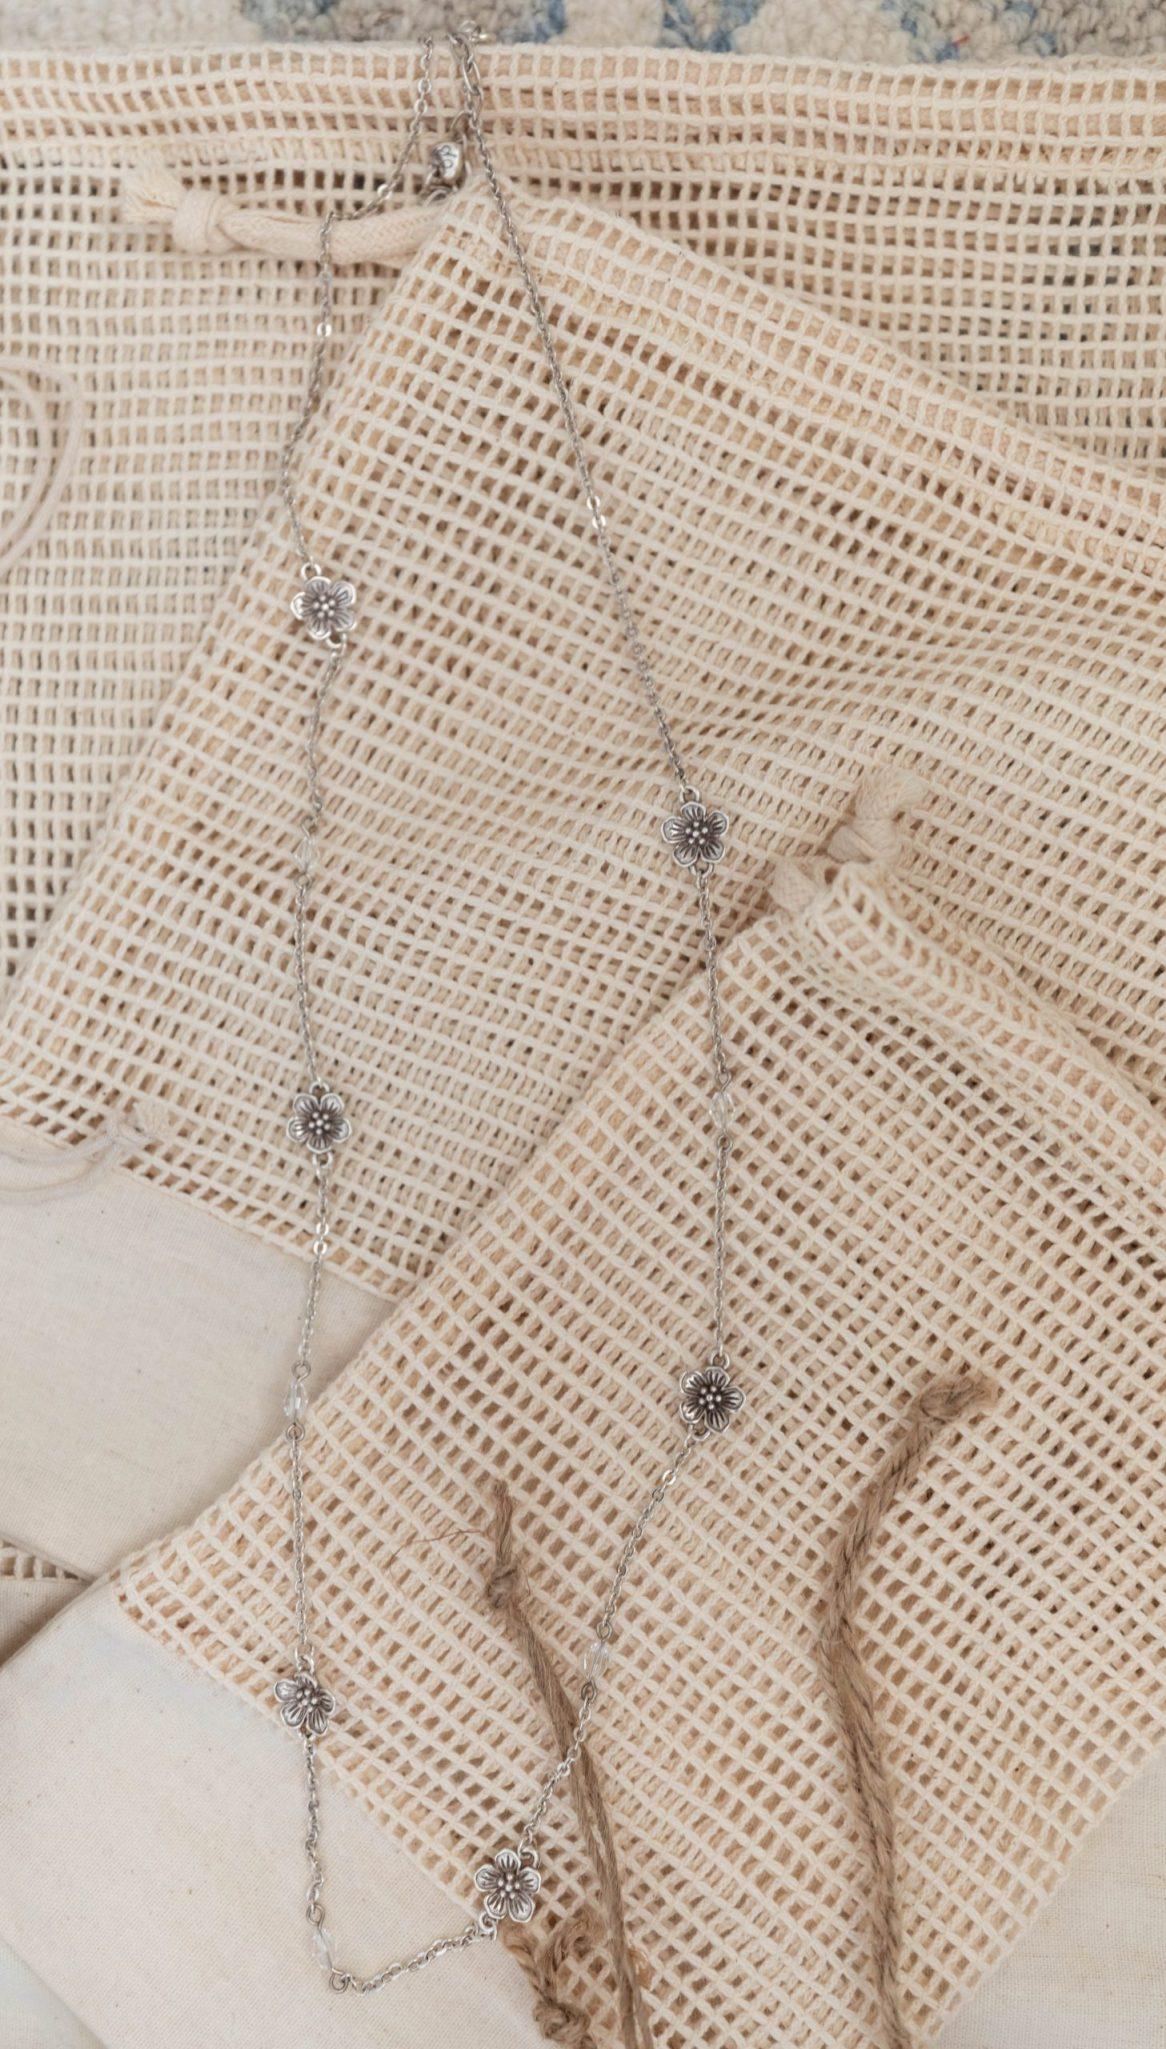 Sakura Necklace and Organic Cotton Reusable Bags Traverse City Calli's & Grand Traverse Resort Shop Finds Annie Fairfax